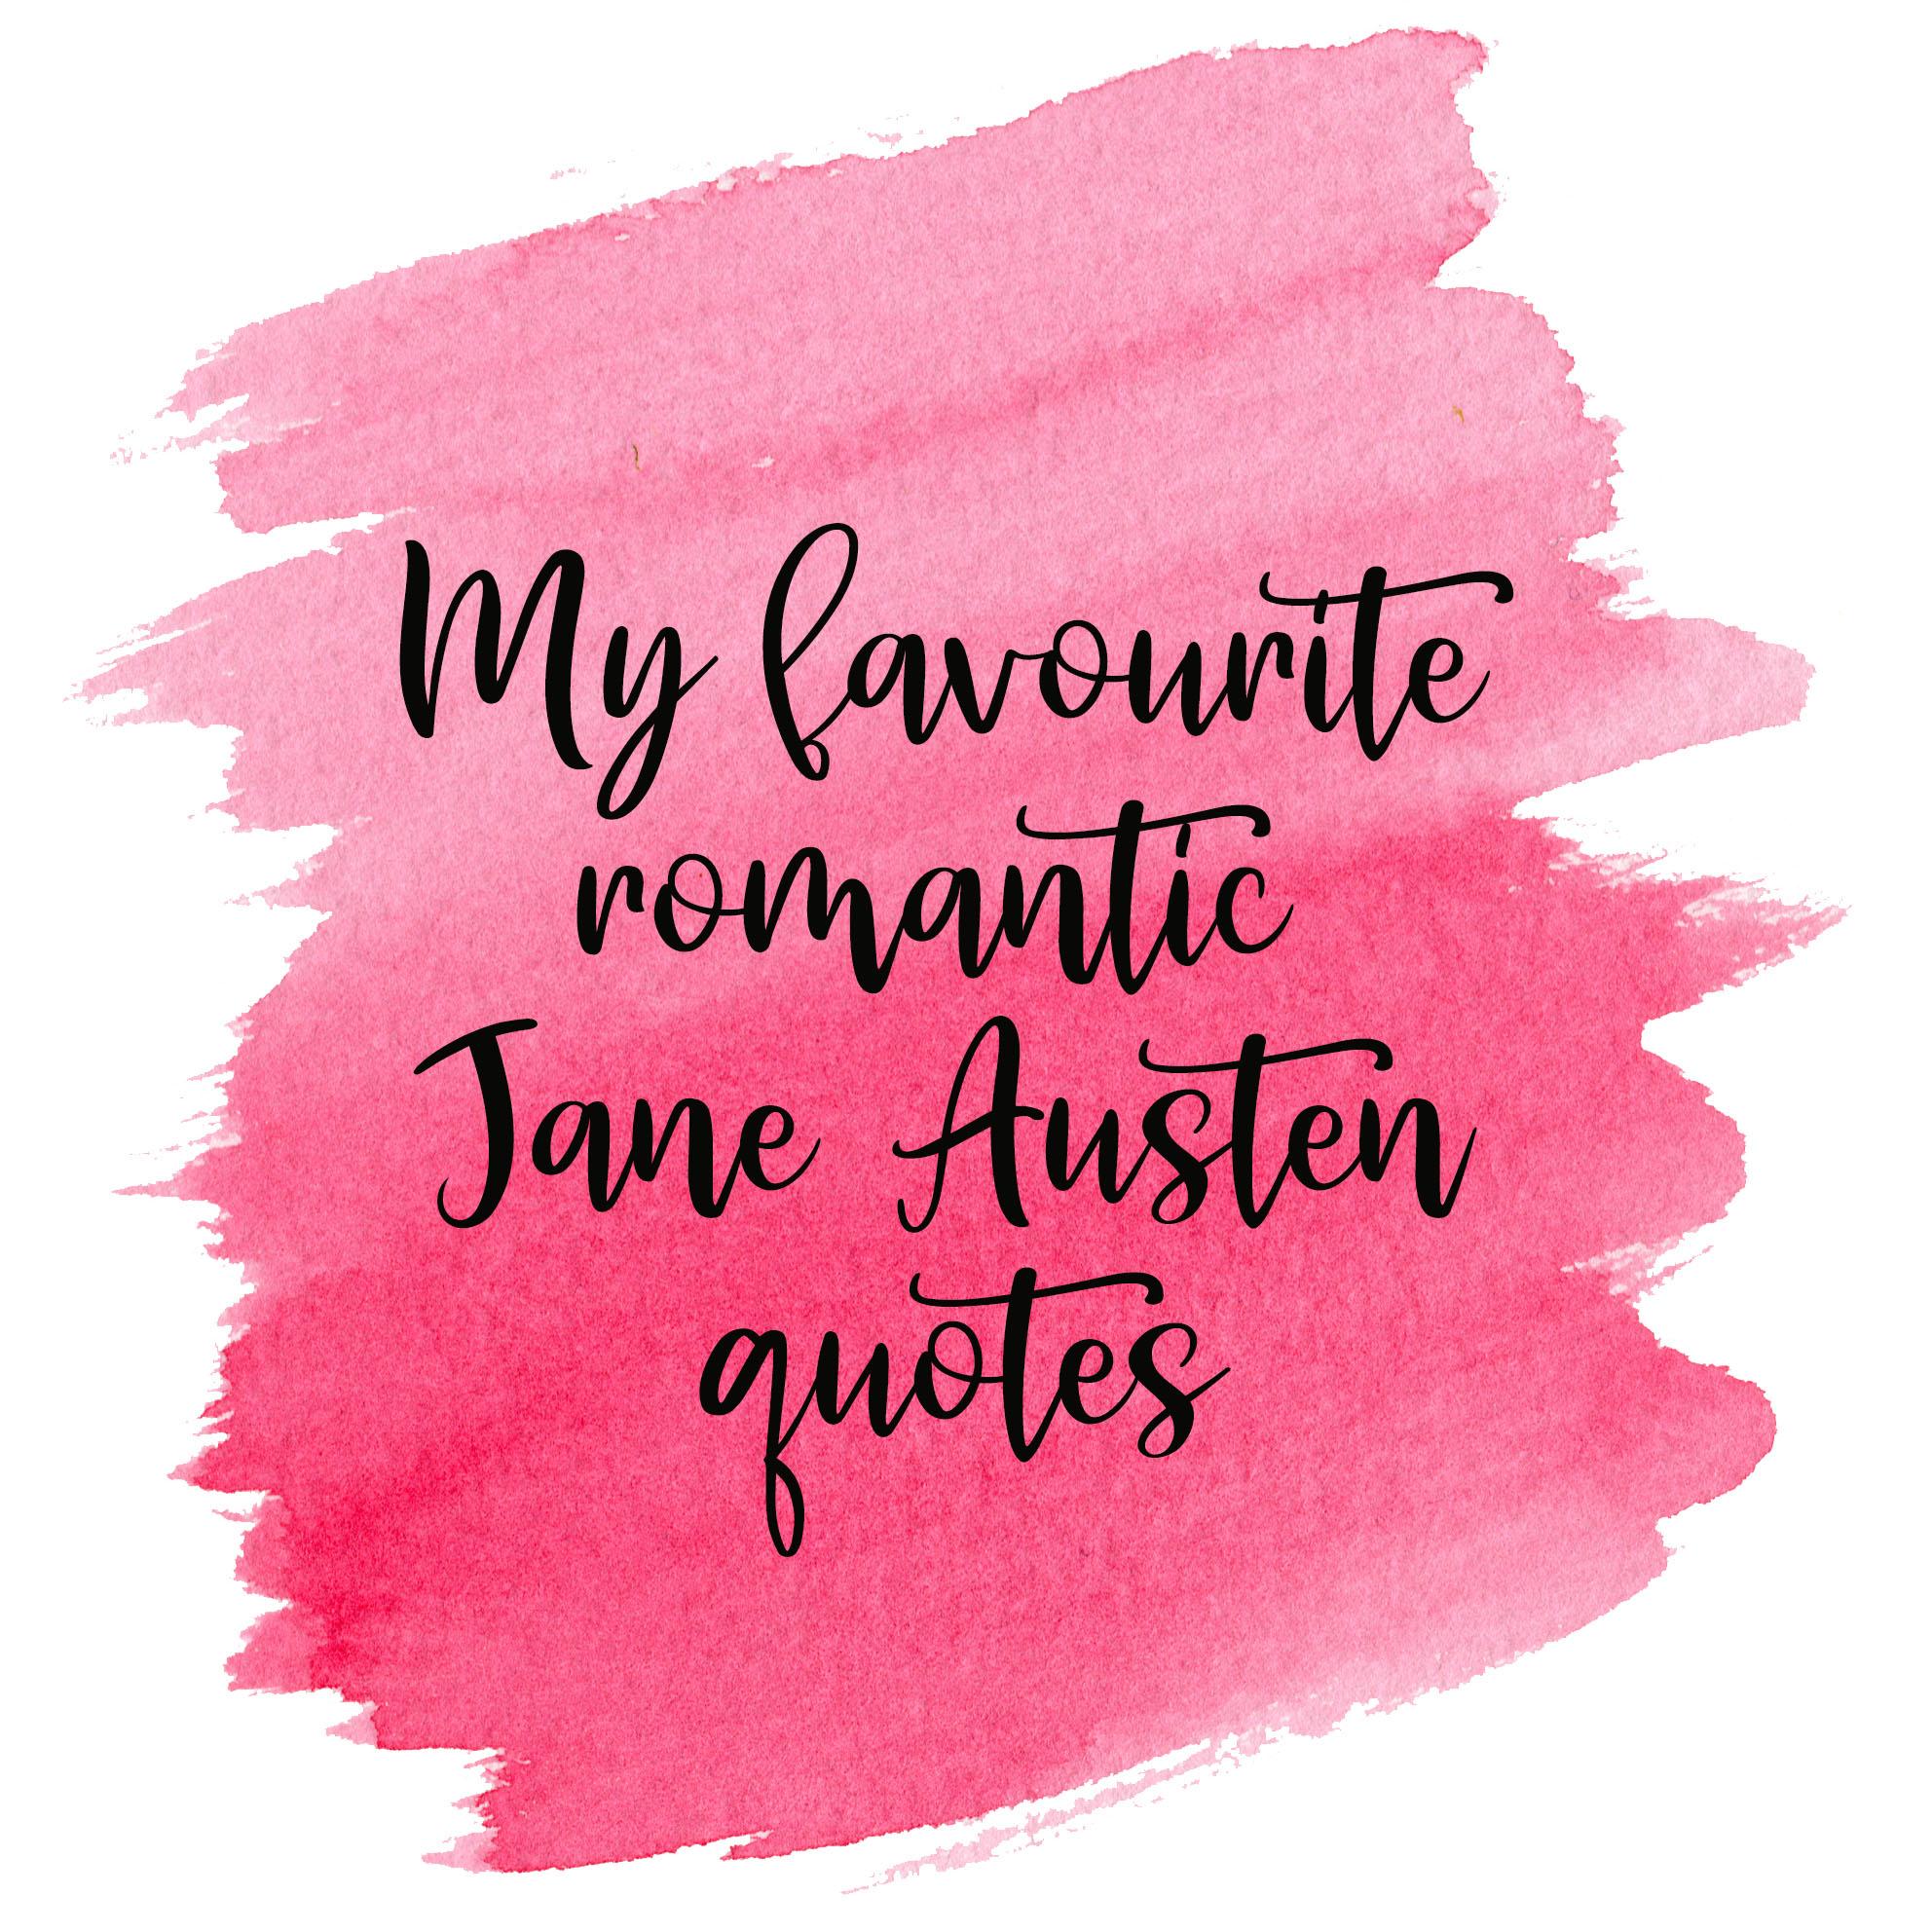 my favourite Jane Austen romantic quotes